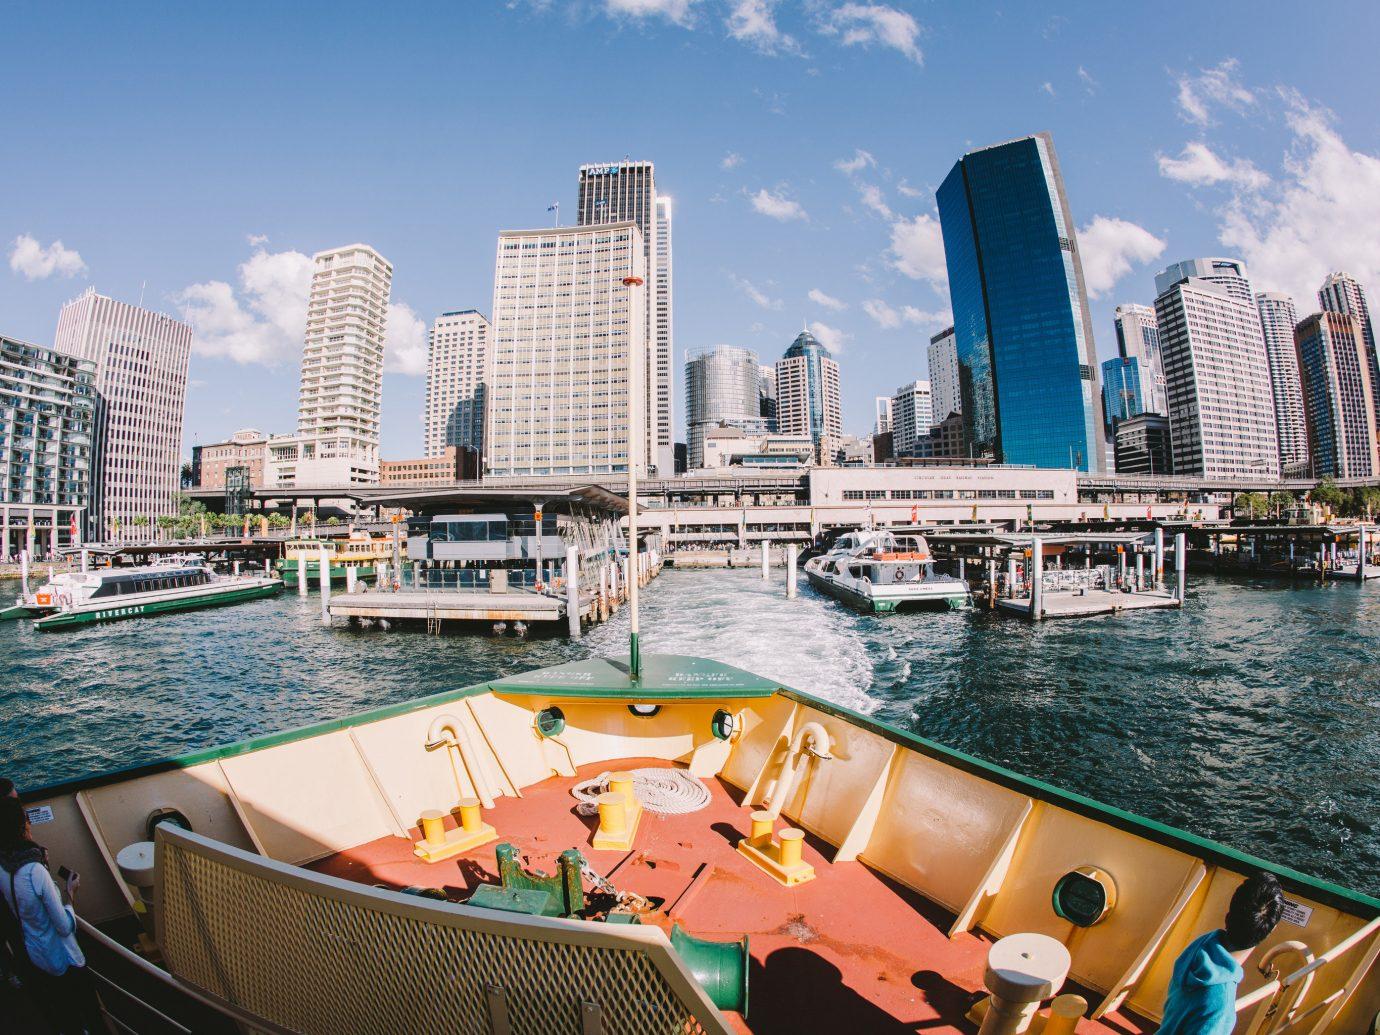 Trip Ideas sky outdoor water skyline Boat vehicle passenger ship marina tourism vacation cityscape Harbor dock yacht watercraft